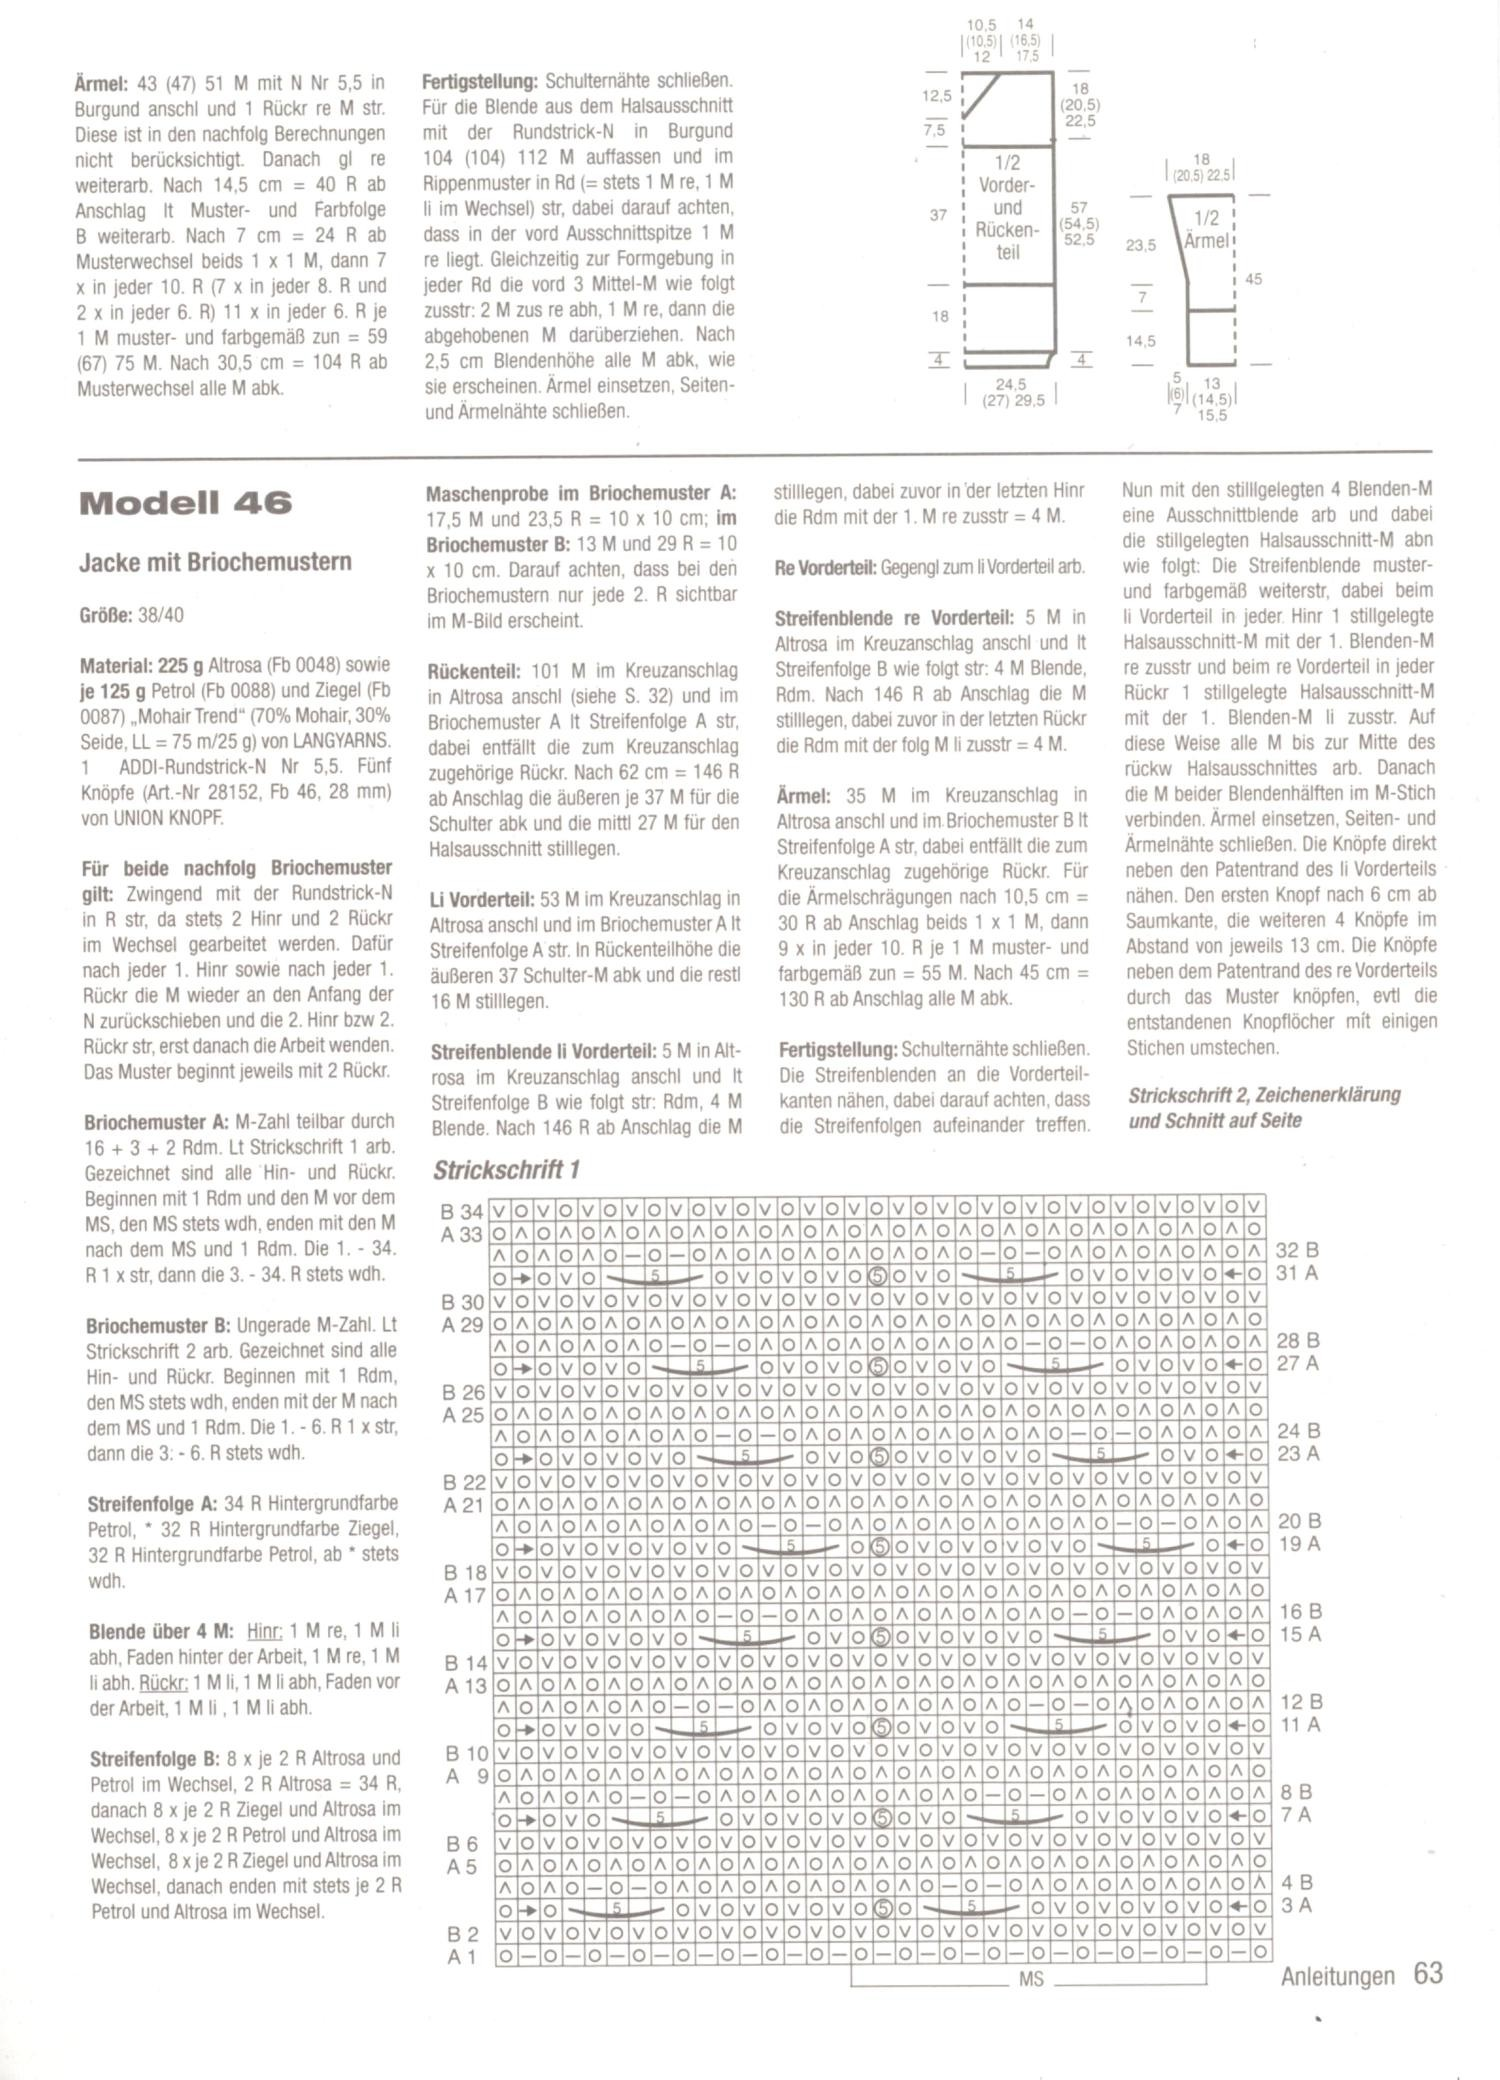 Page_00063.jpg